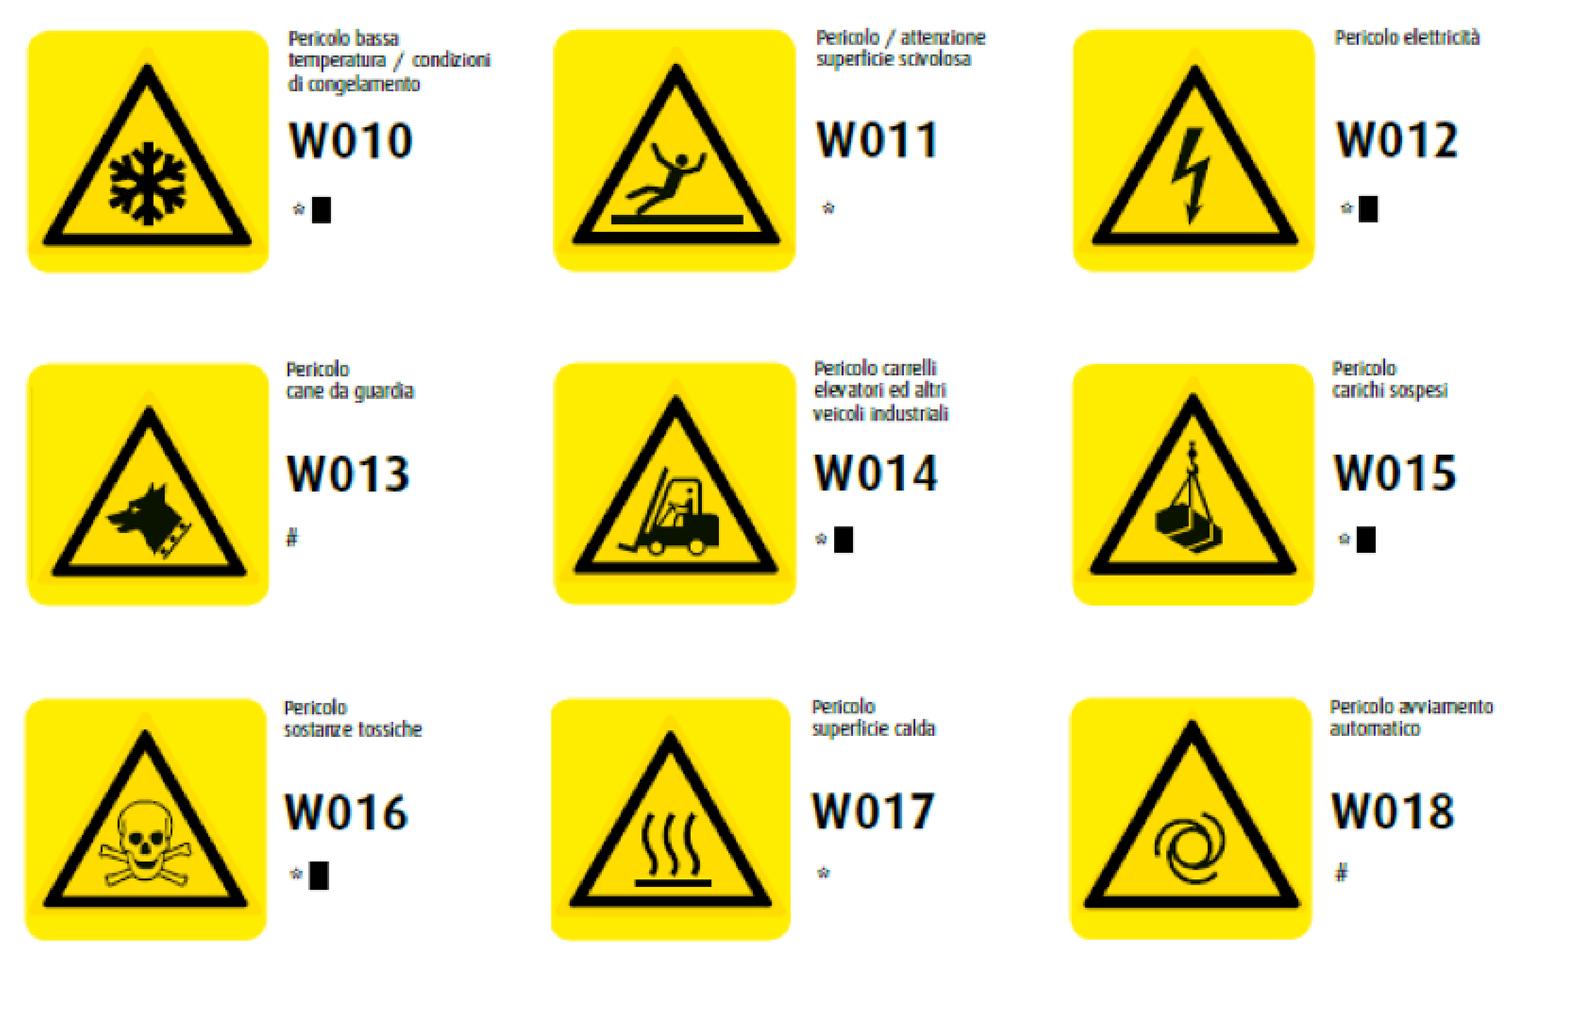 segnali di avvertimento Ellepi